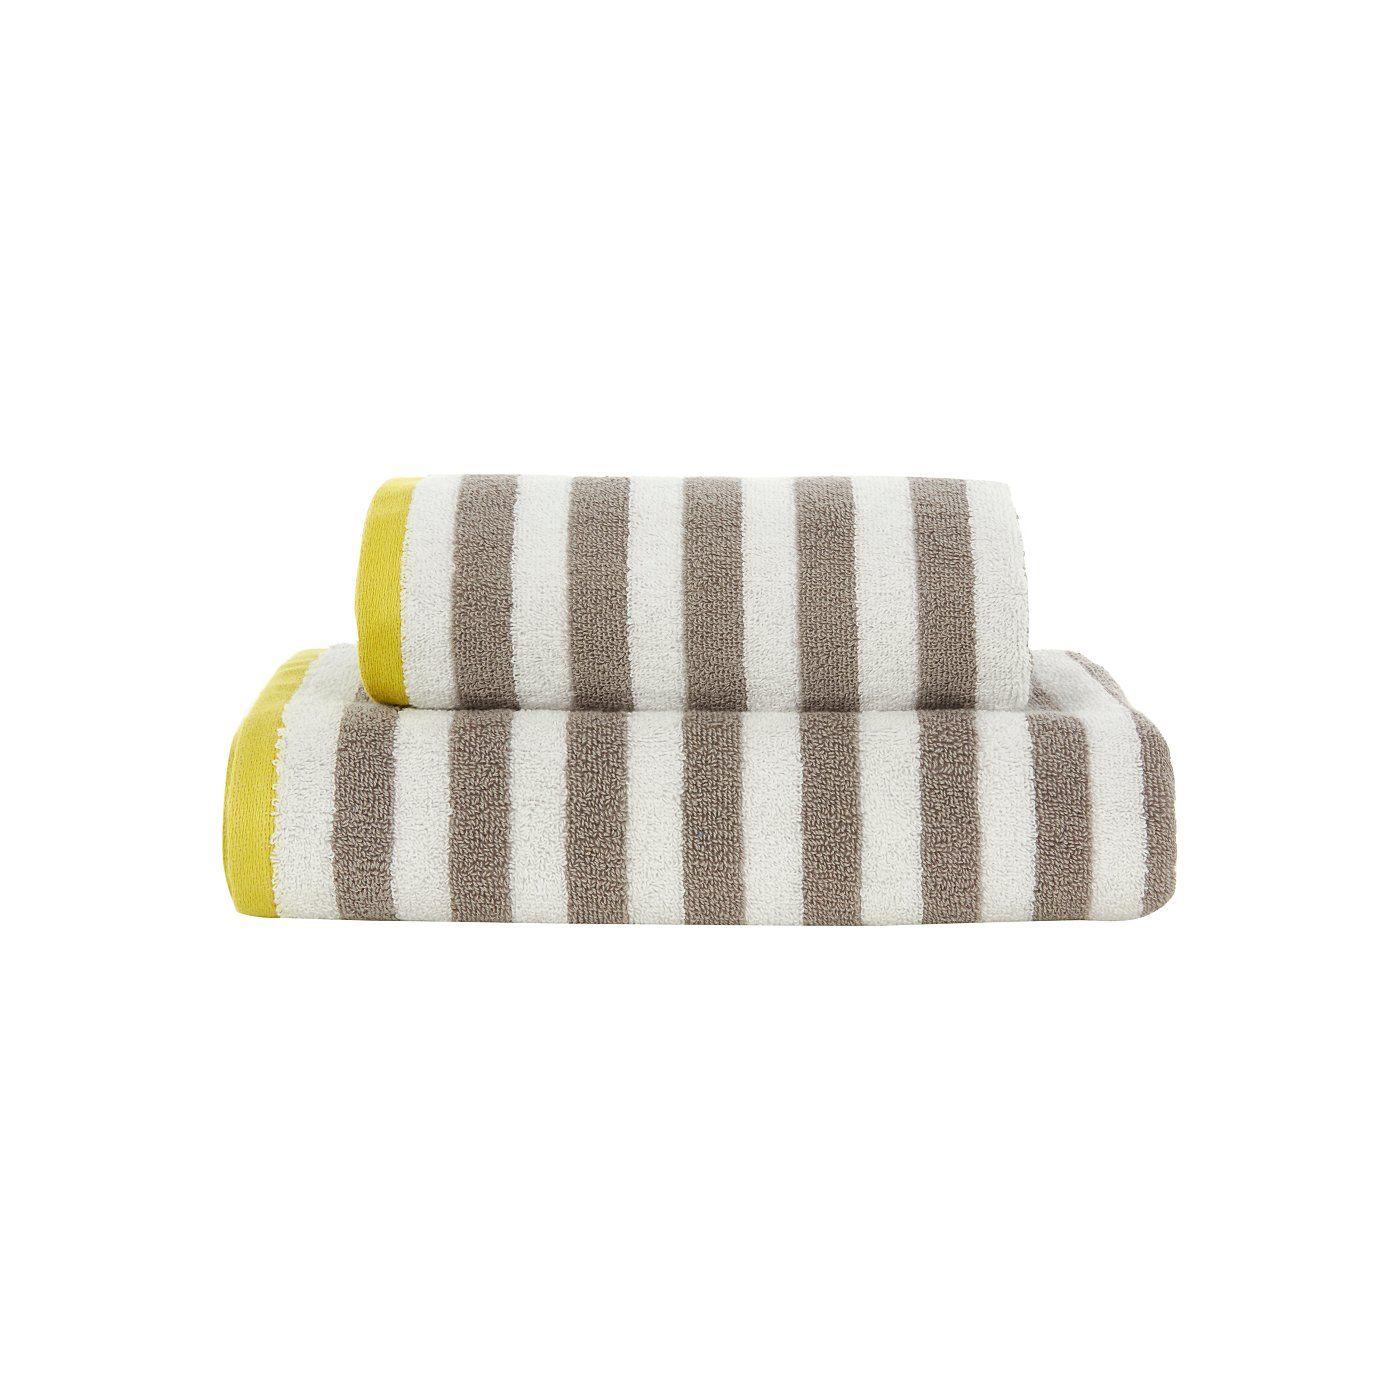 George Home Grey and Yellow Stripe Towel Range | Towels & Bath Mats | ASDA  direct